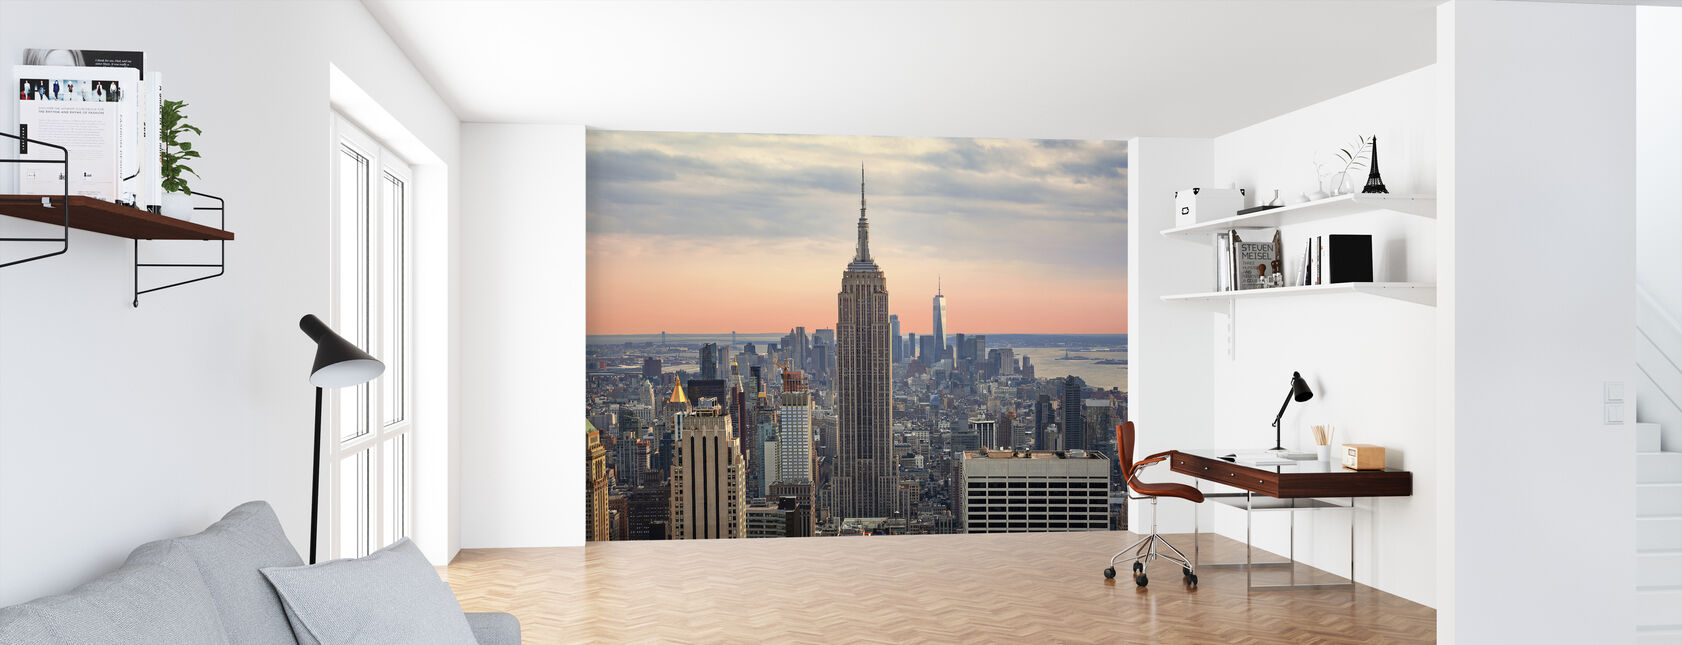 Manhattan Skyline - Wallpaper - Office